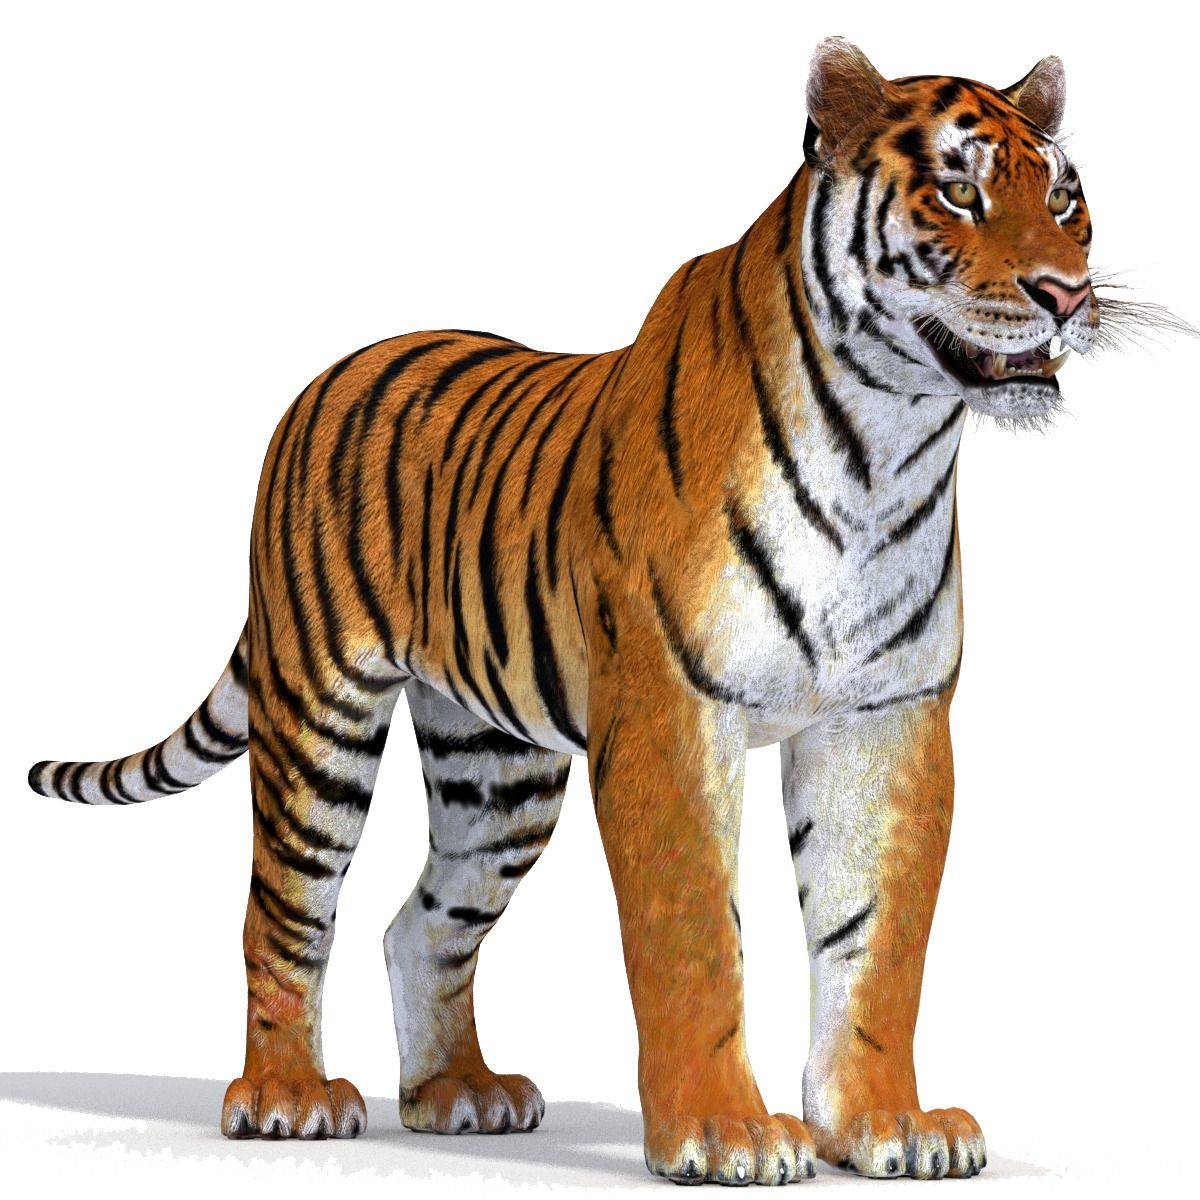 Realistic Tiger 3D Model Животные, Тигр